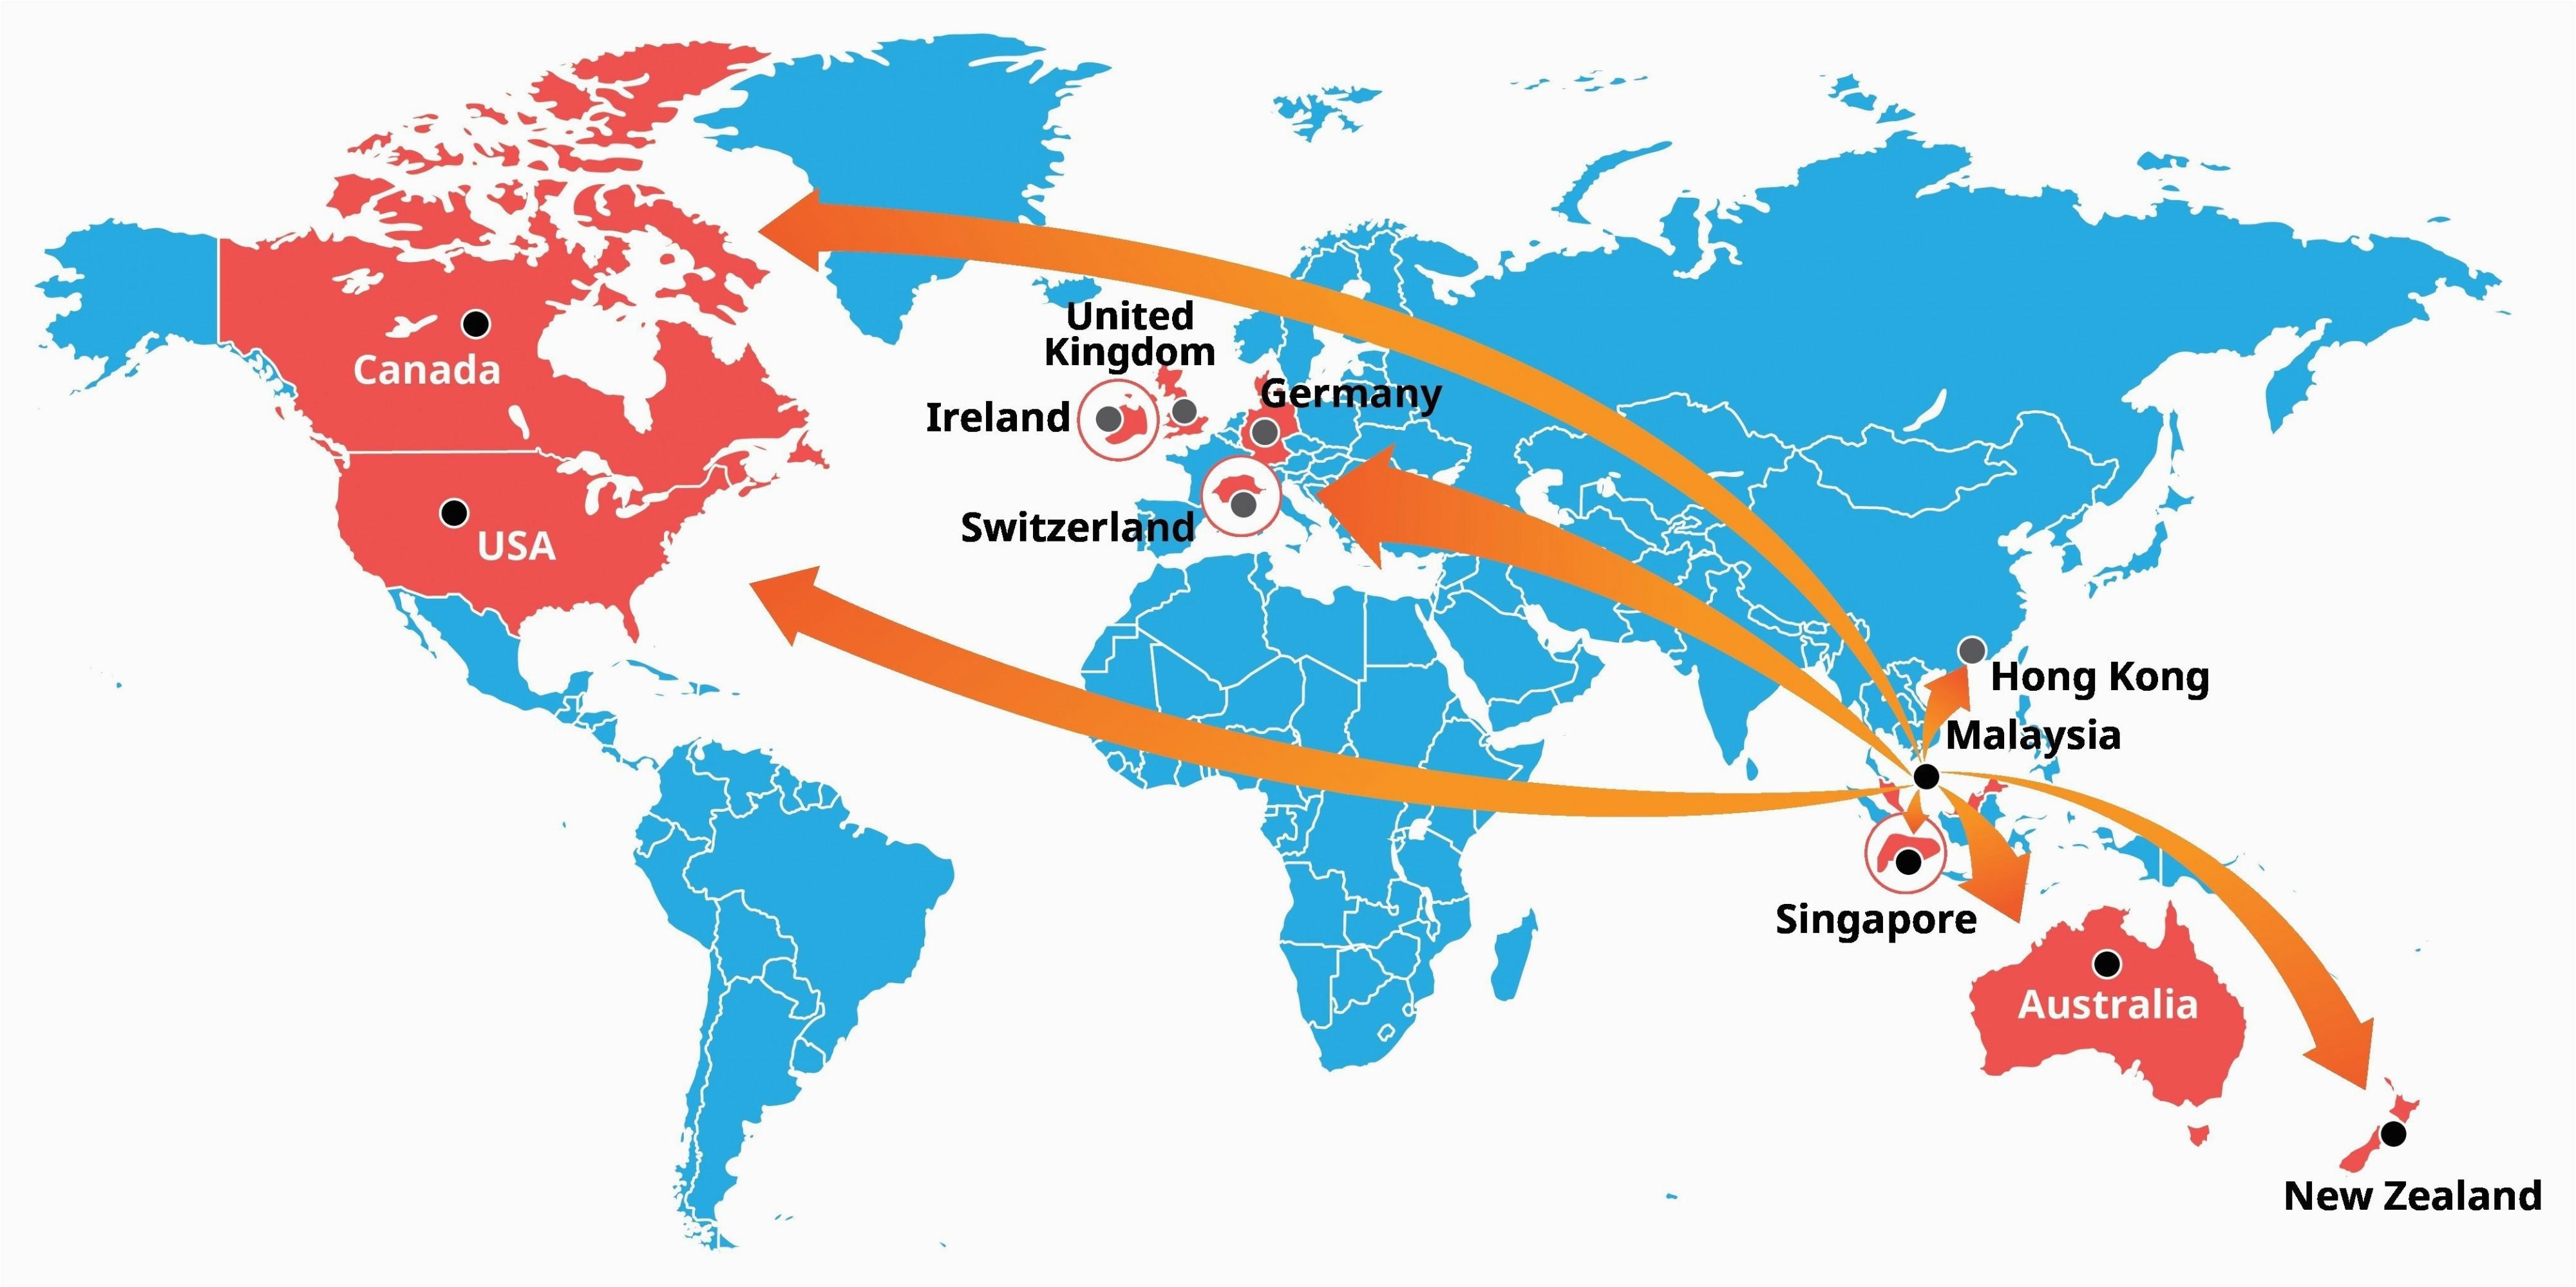 Ireland World Map Location Singapore Location On World Map Climatejourney org